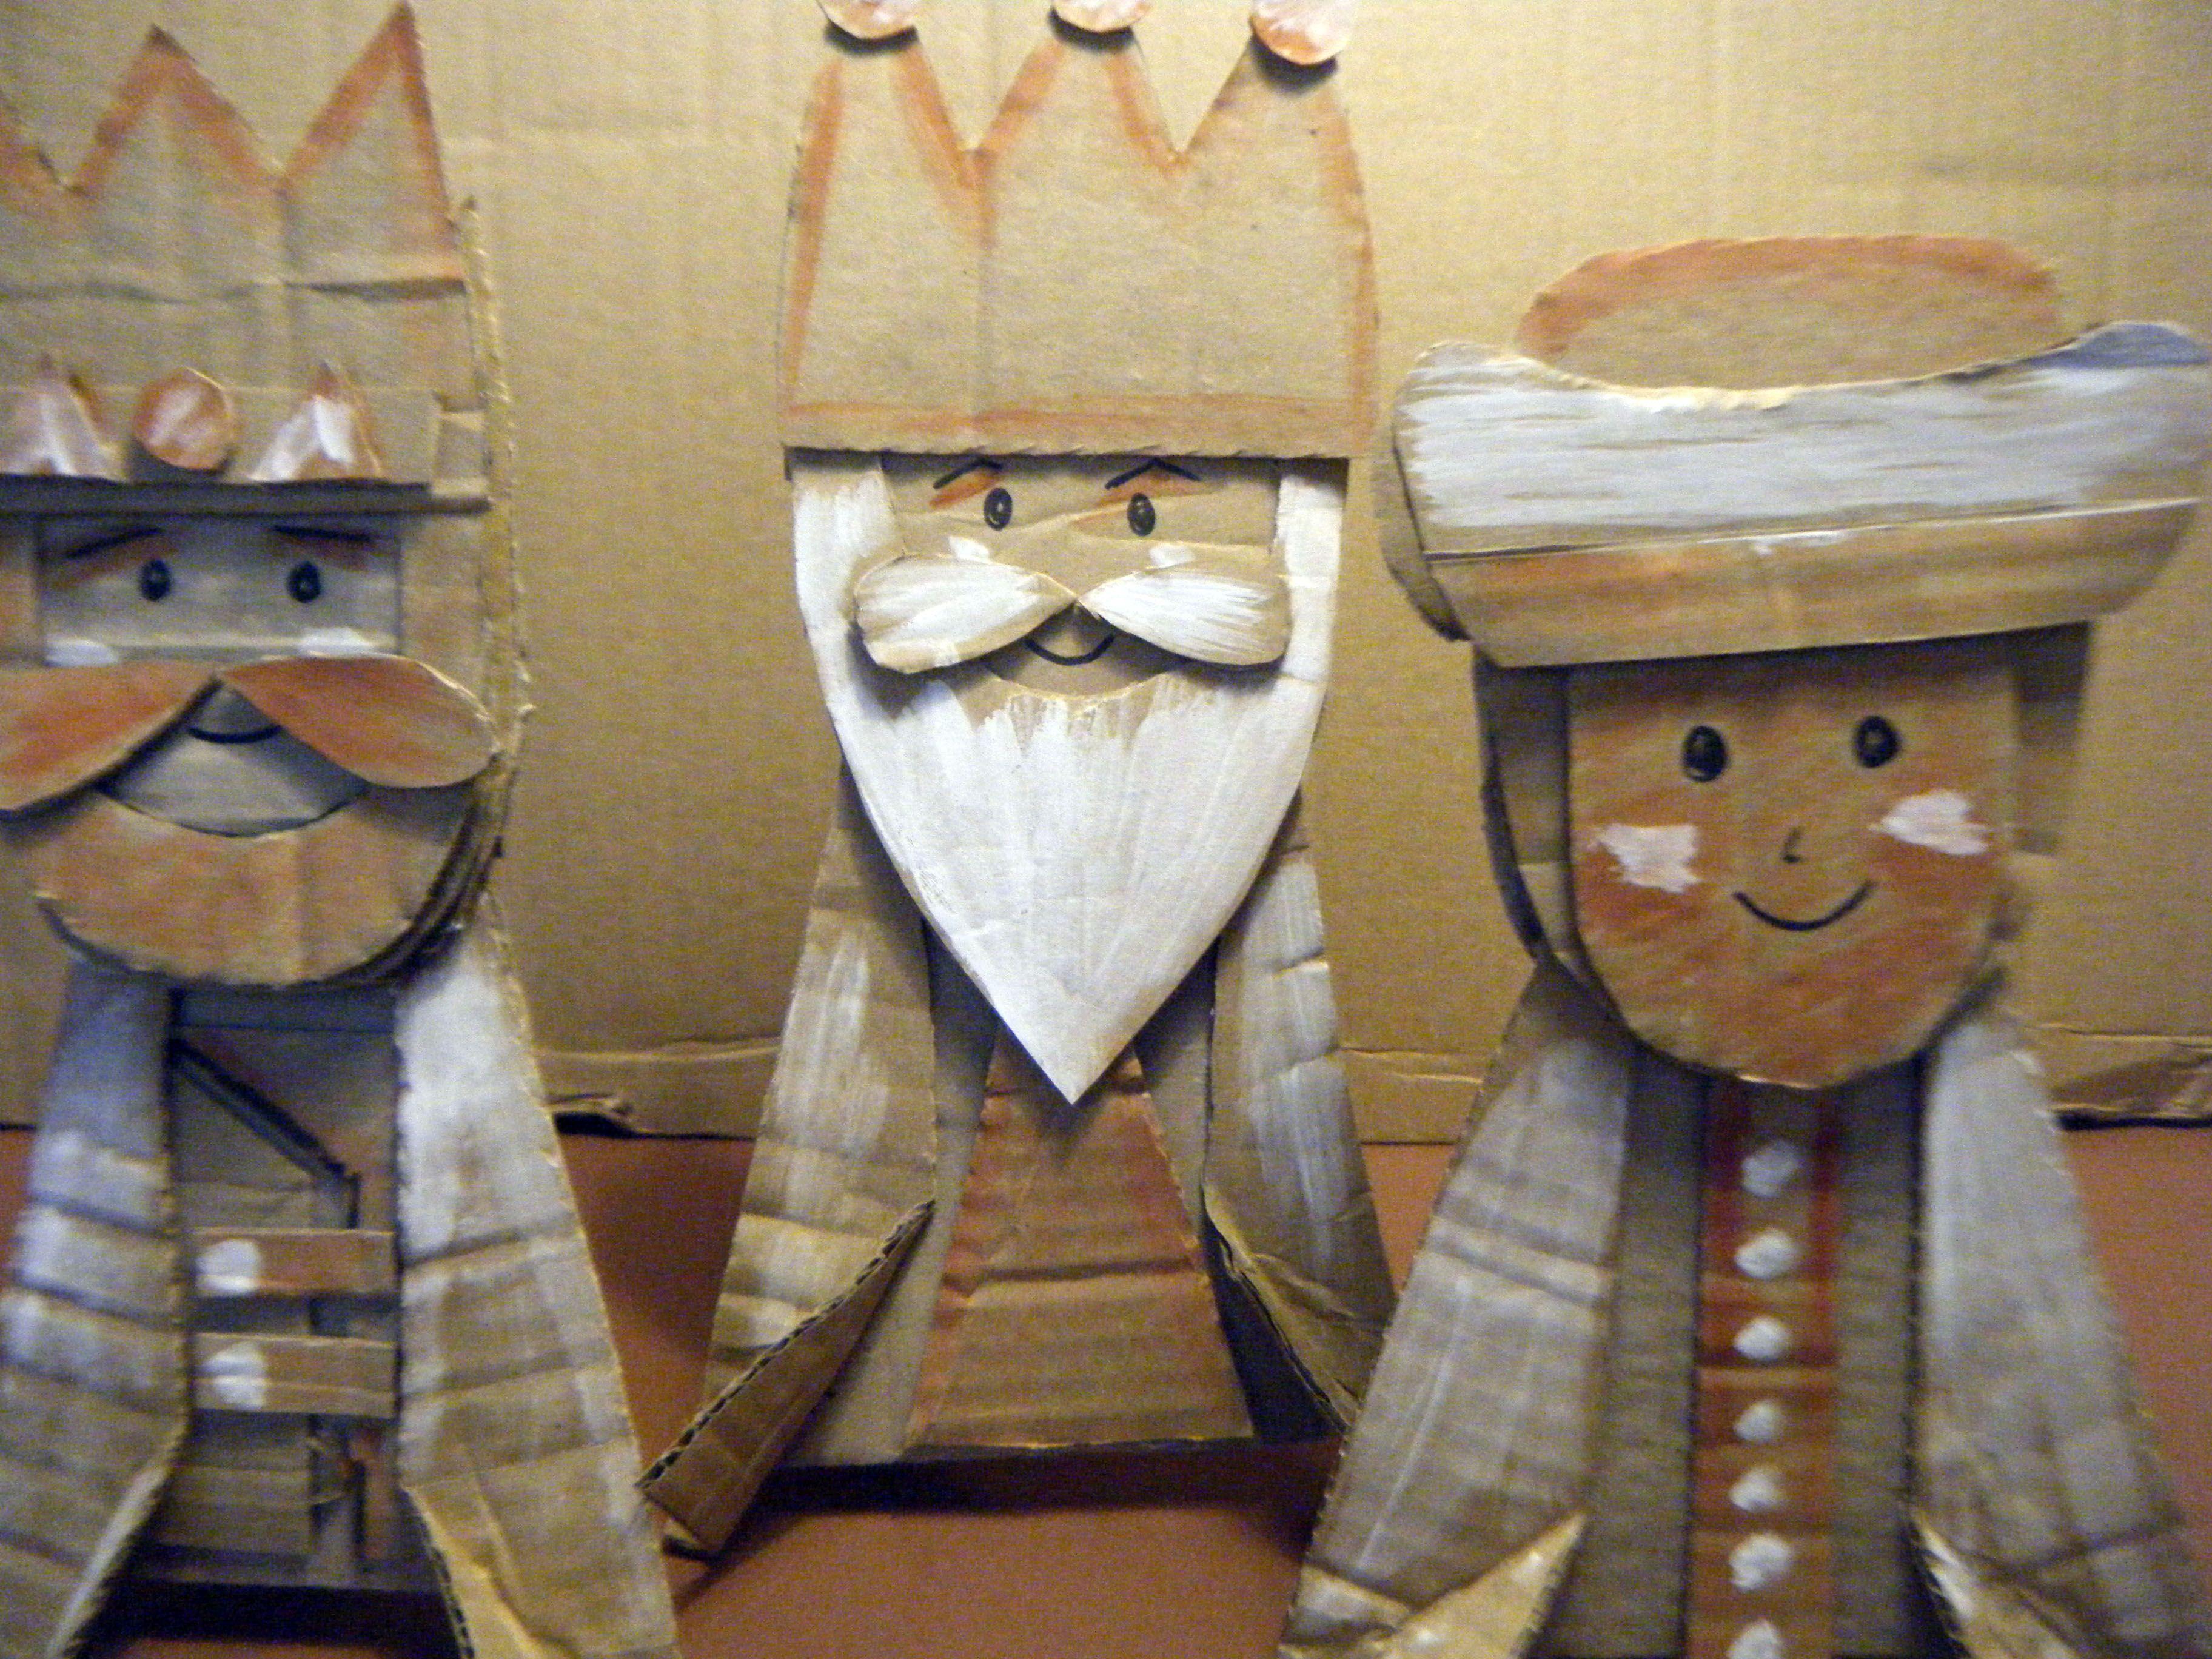 The Three Kings Cardboard Crafts & DIY Ideas